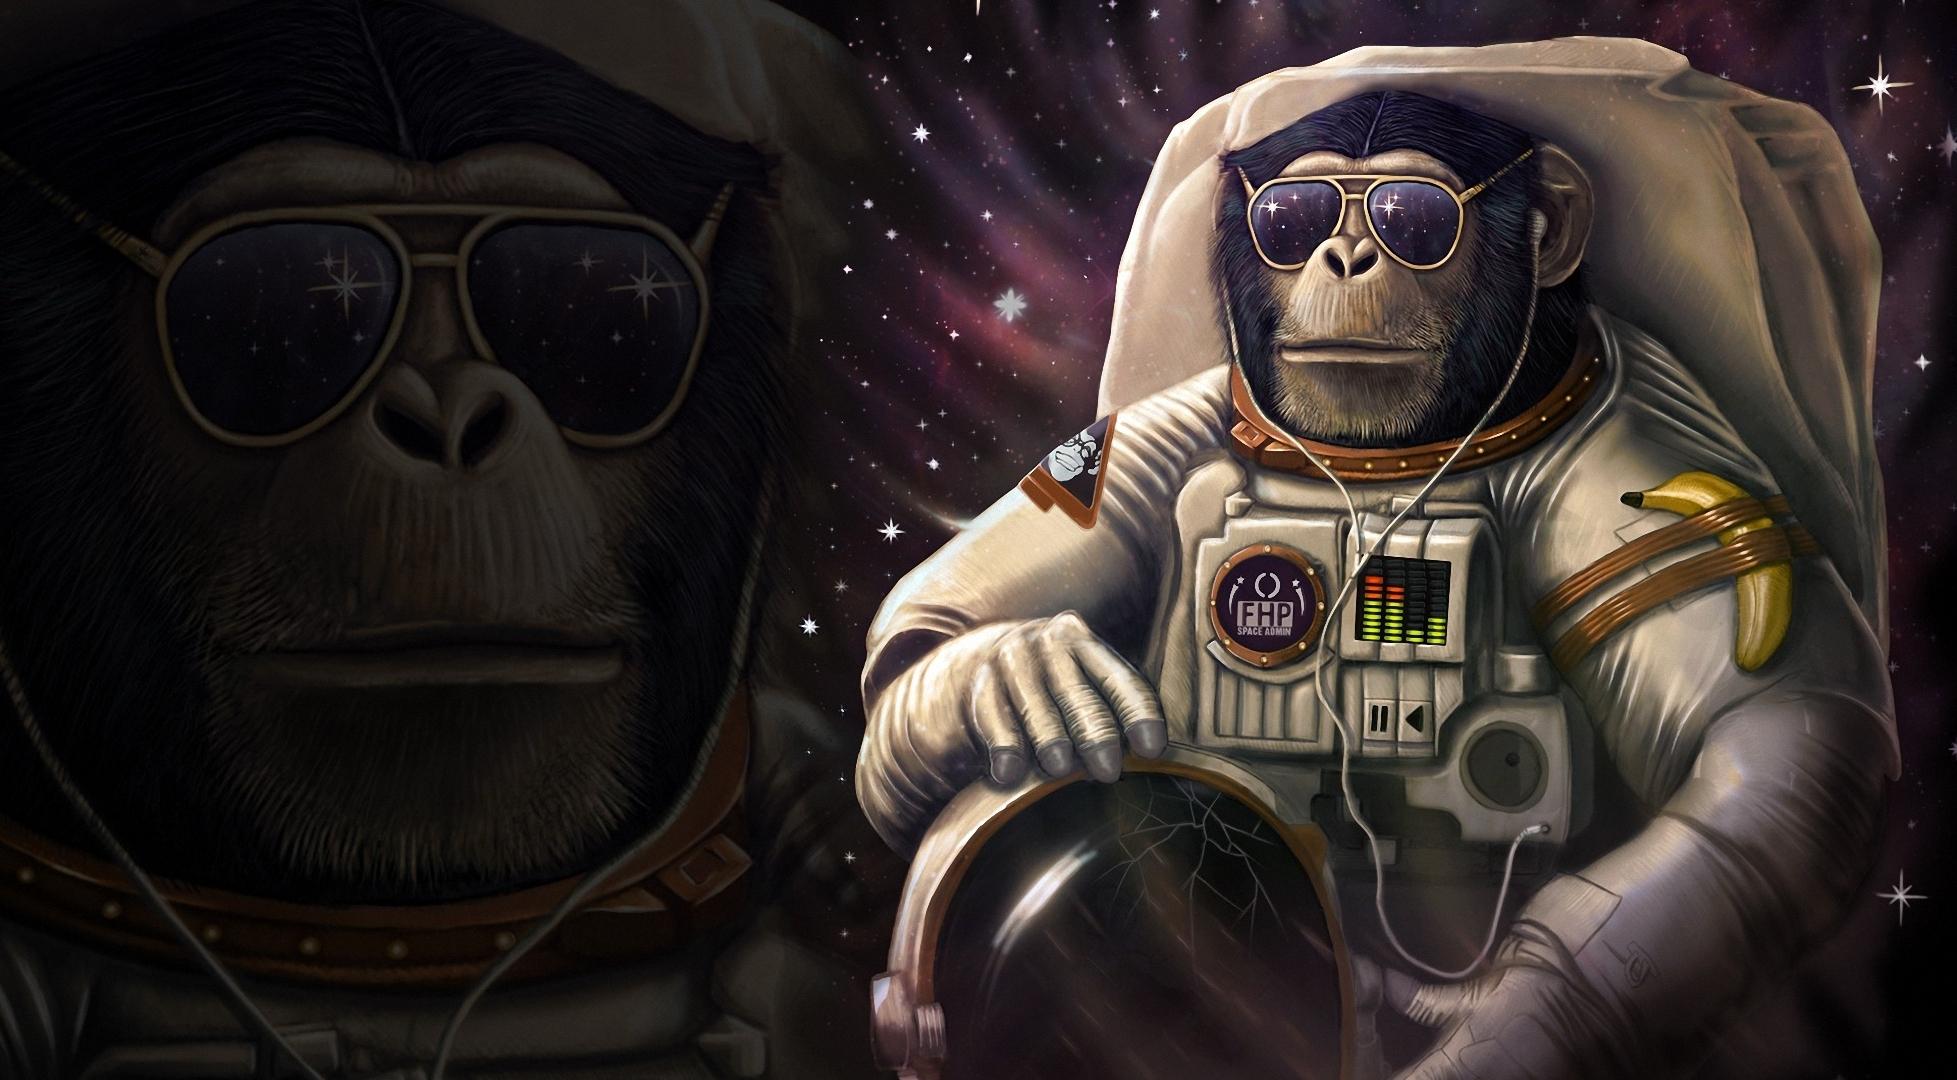 Macaco Astronautas Óculos Capacete animalia, um animal, engraçados, macacos, astronauta, cosmonauta, Lunettes Fantasia Animalia Espaço Humor